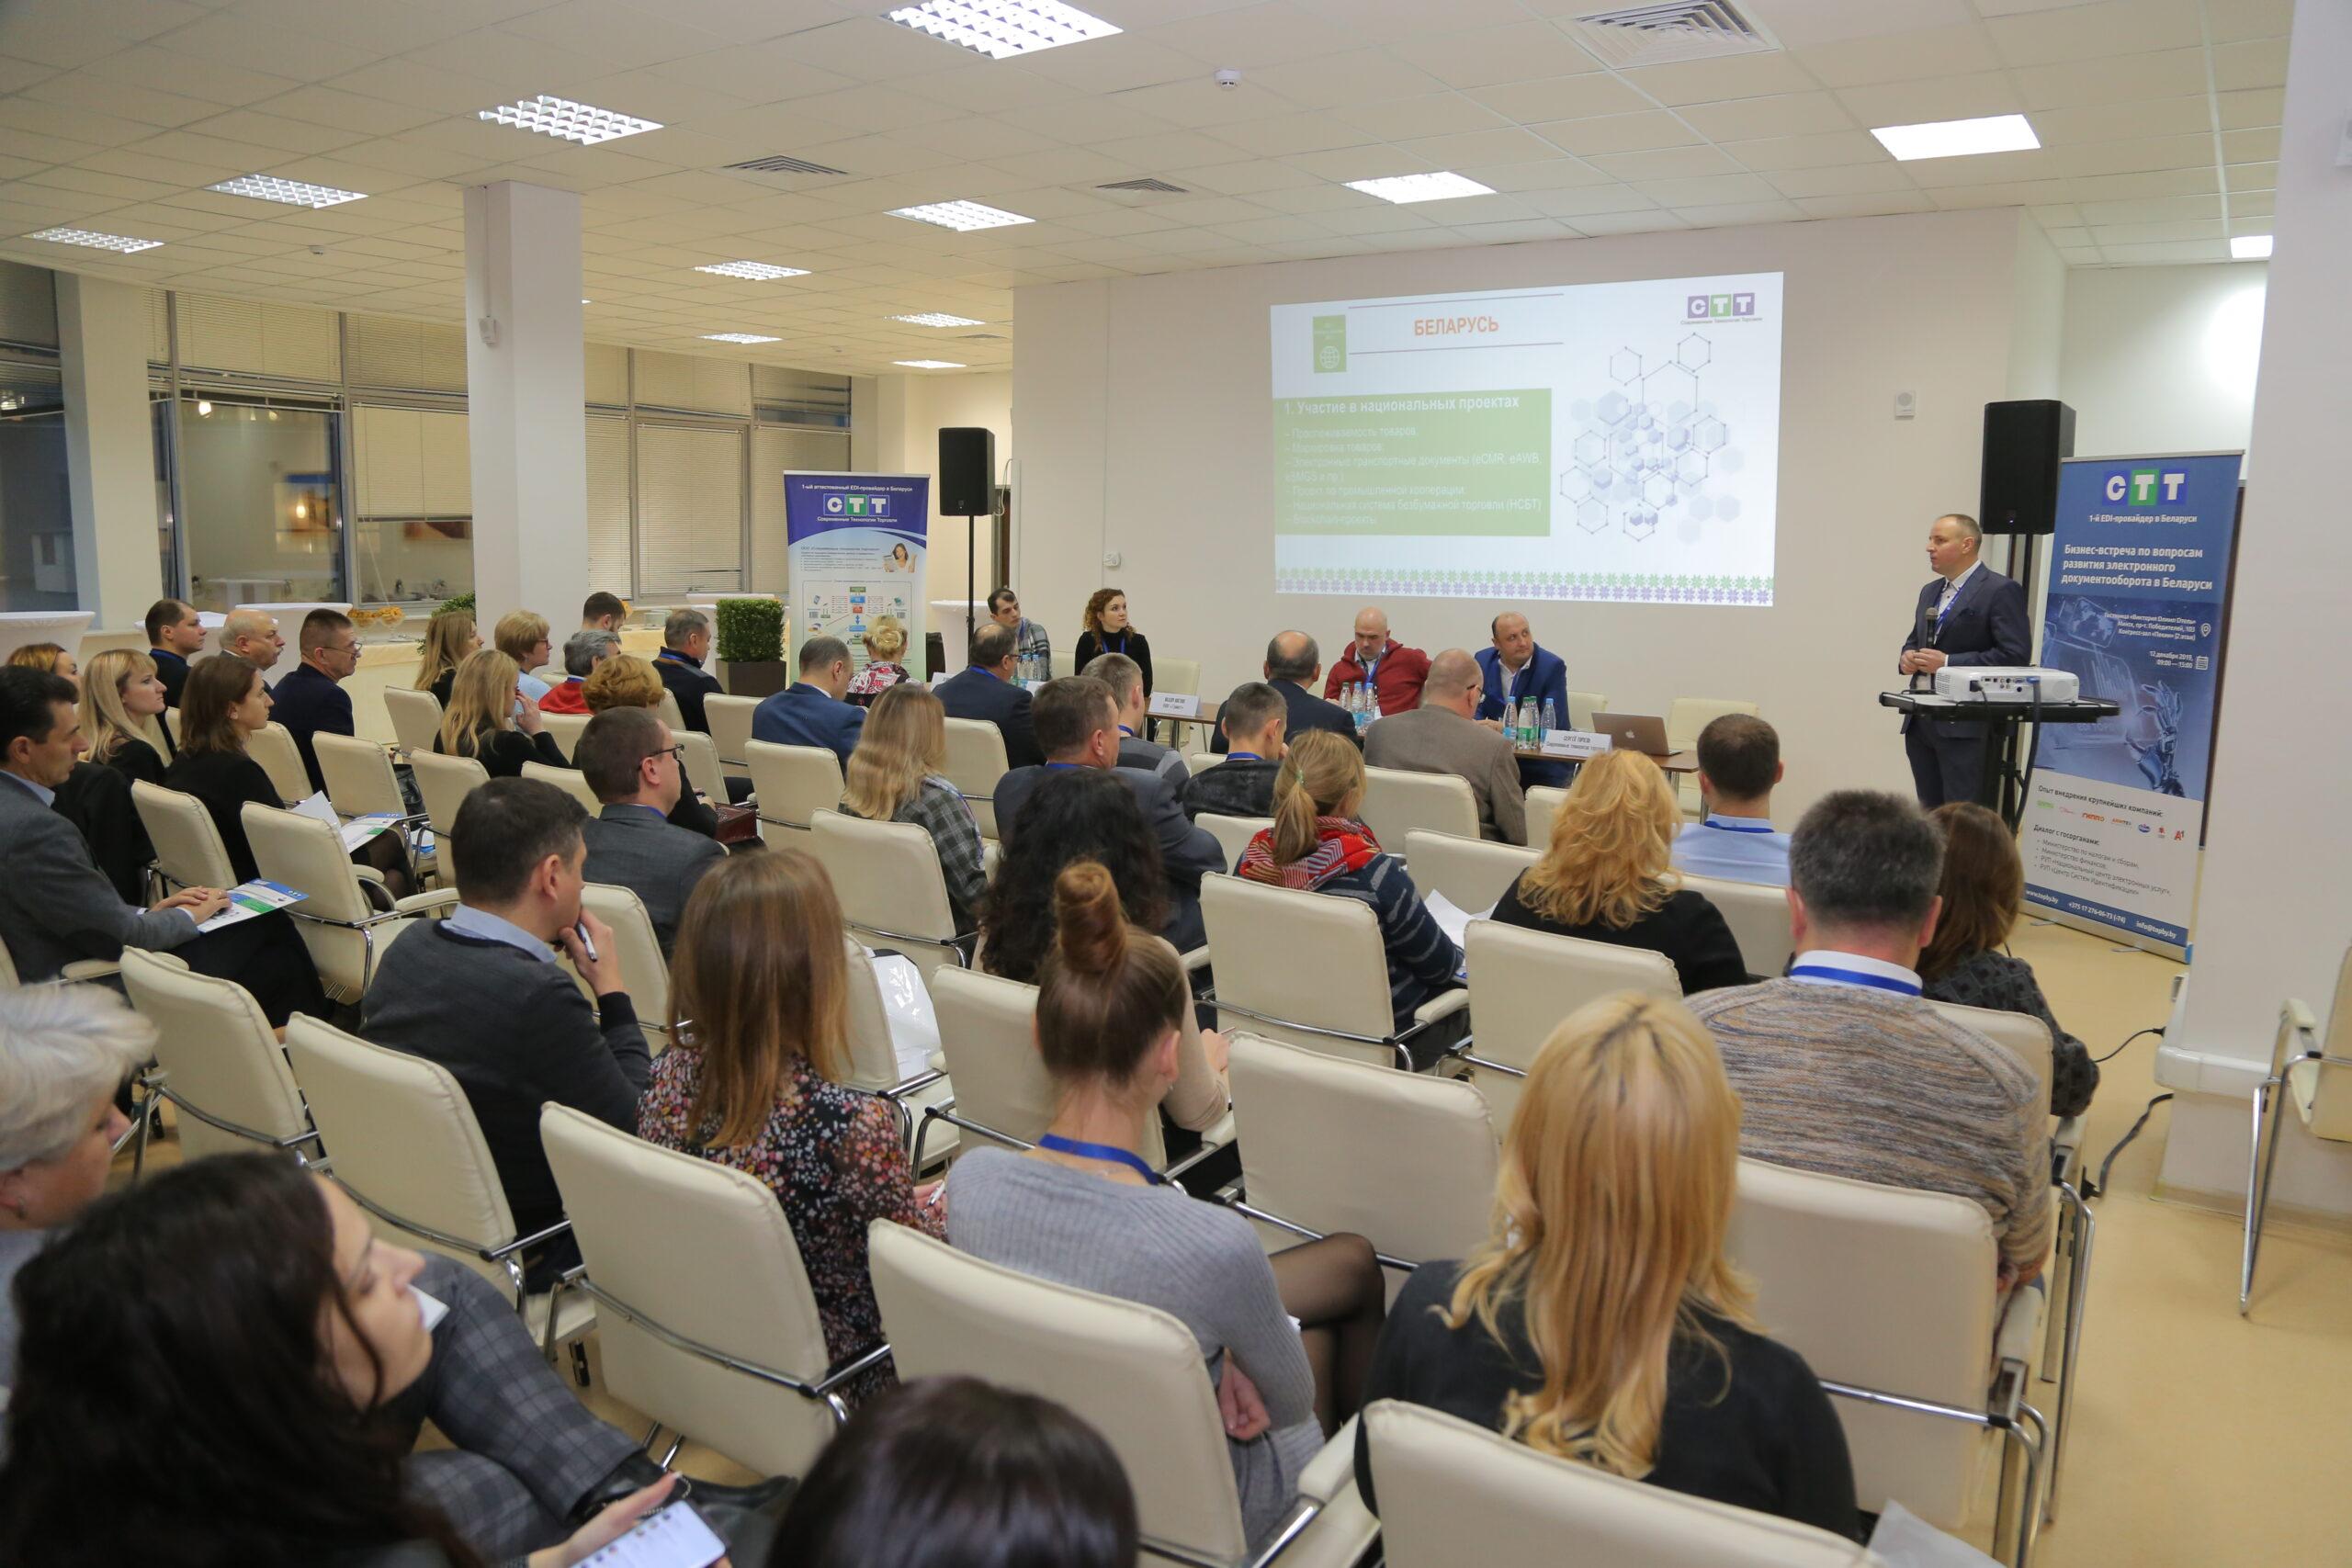 Бизнес-встреча по вопросам развития электронного документооборота в Беларуси — 2019